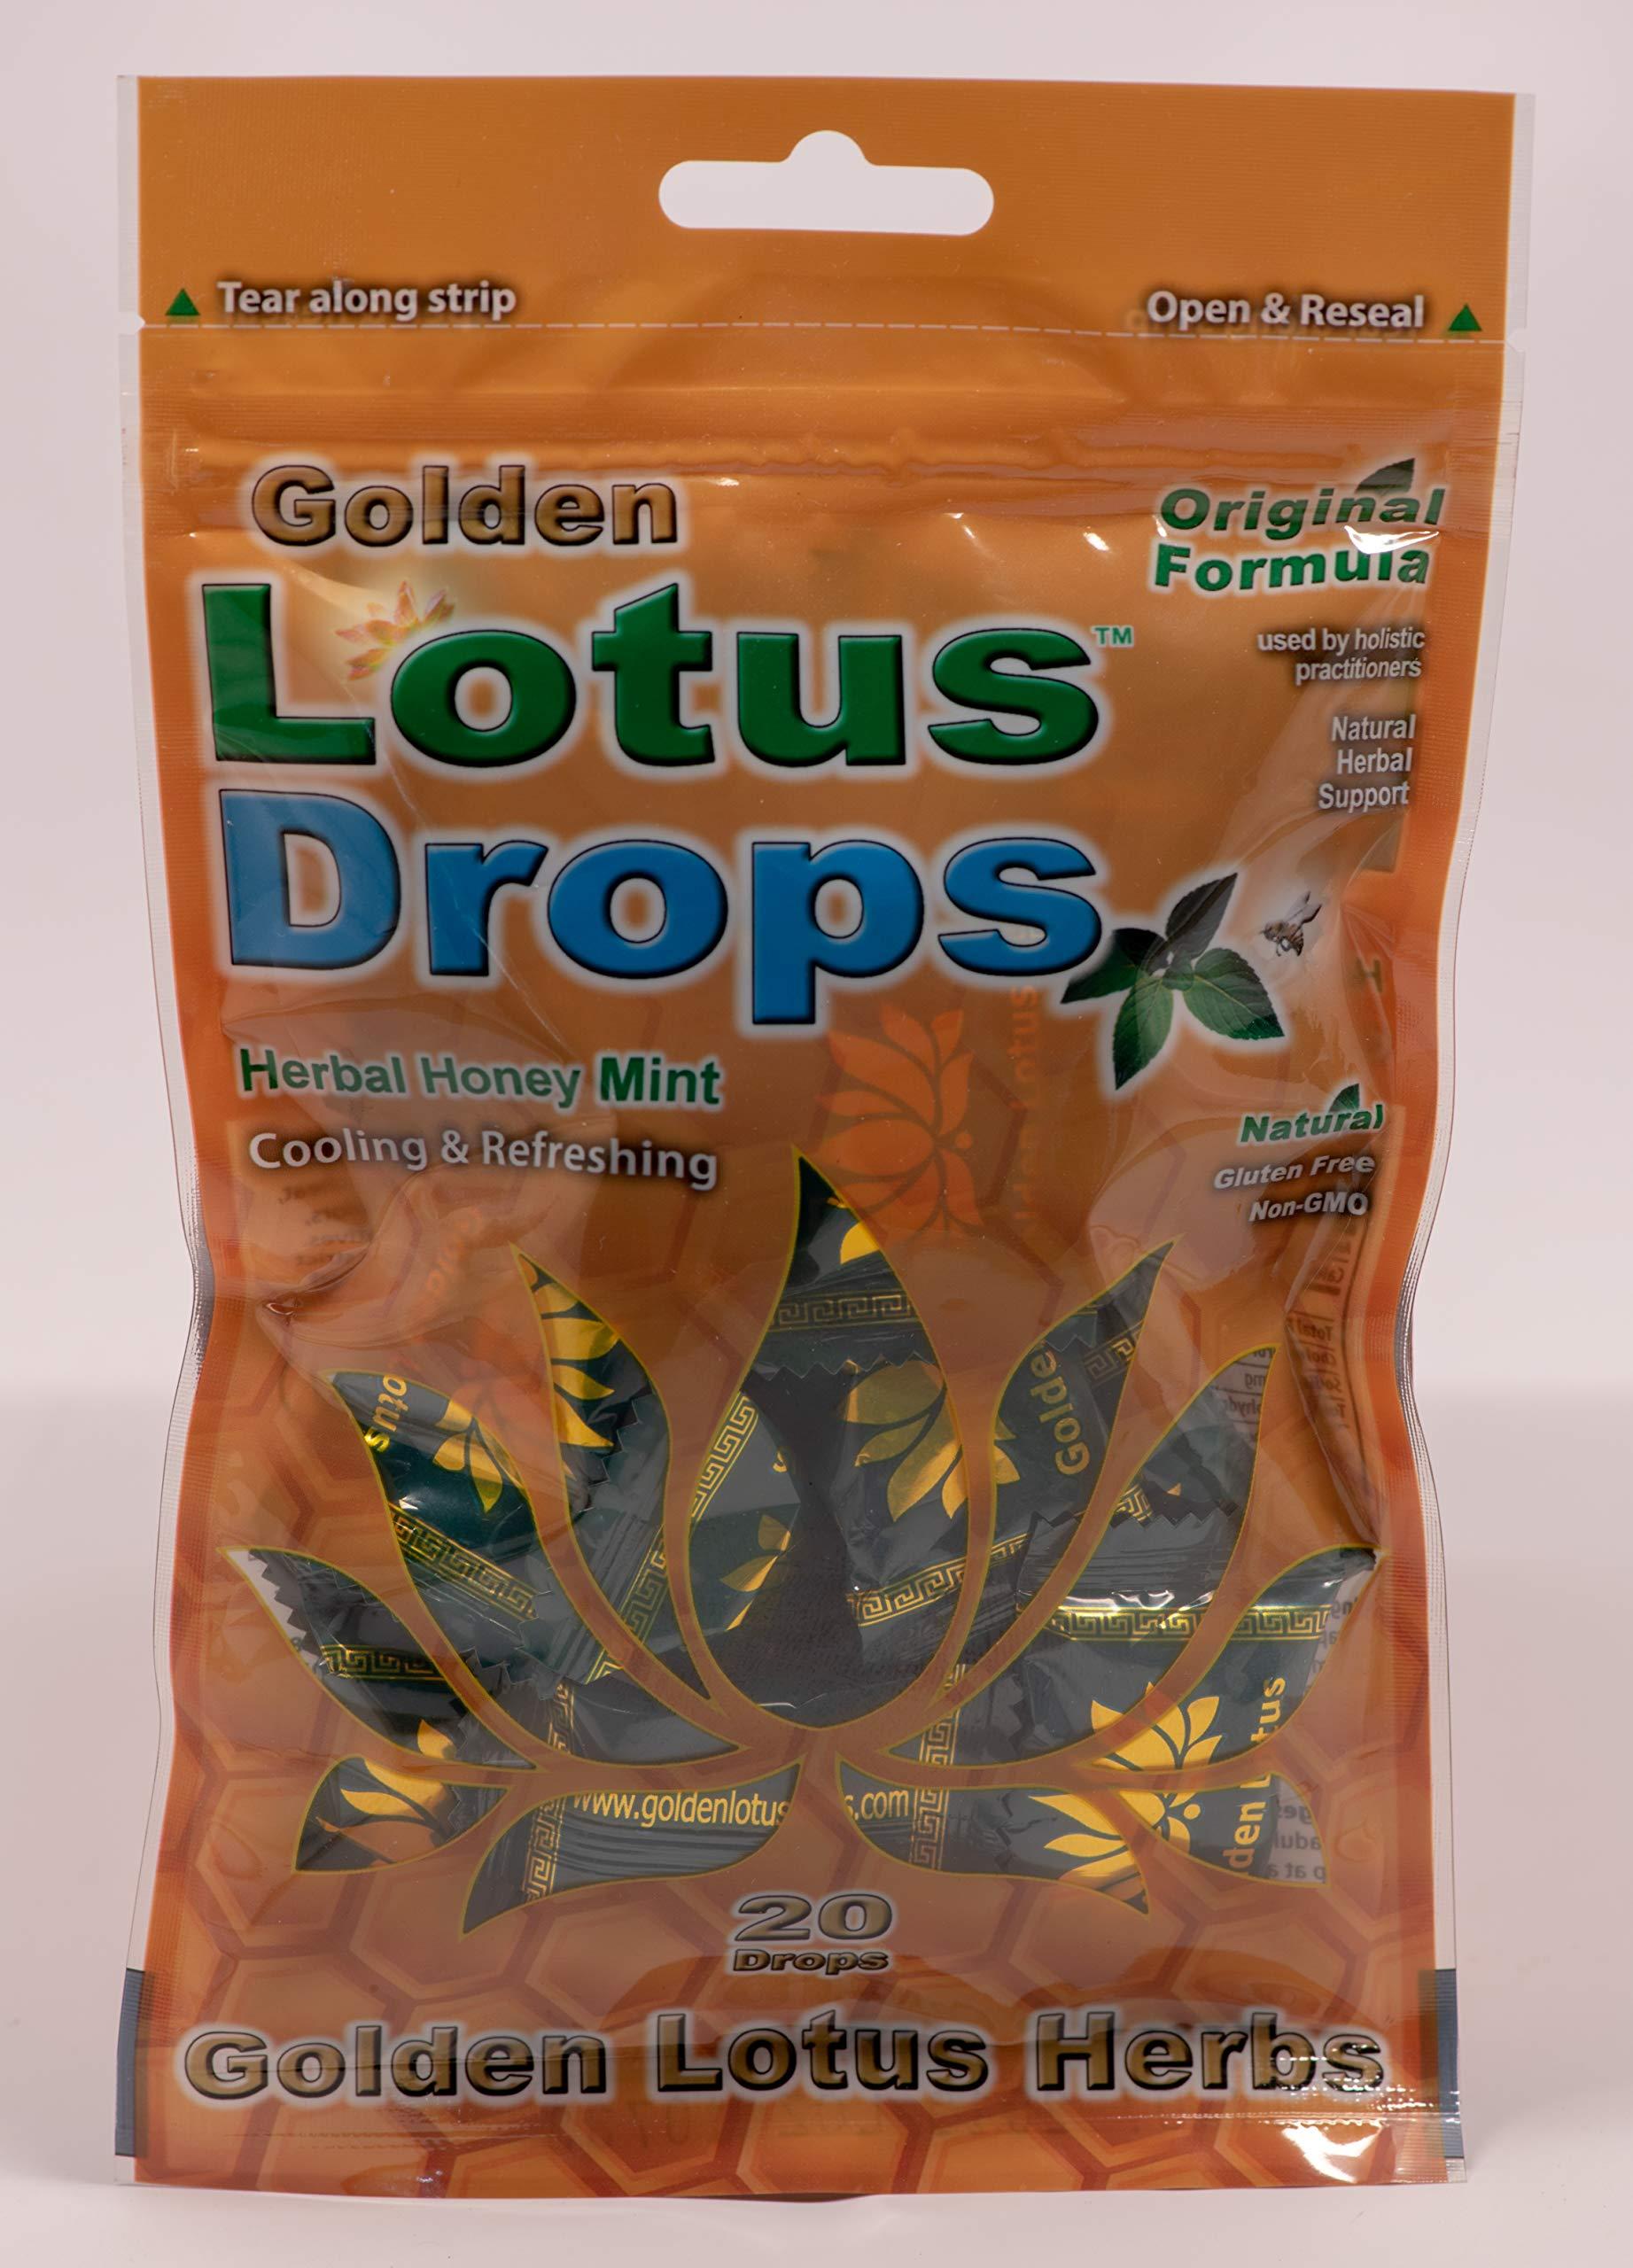 GOLDEN LOTUS HERBS Golden Lotus Drops Single Pk (Original Formula), 20 Count by Golden Lotus Herbs